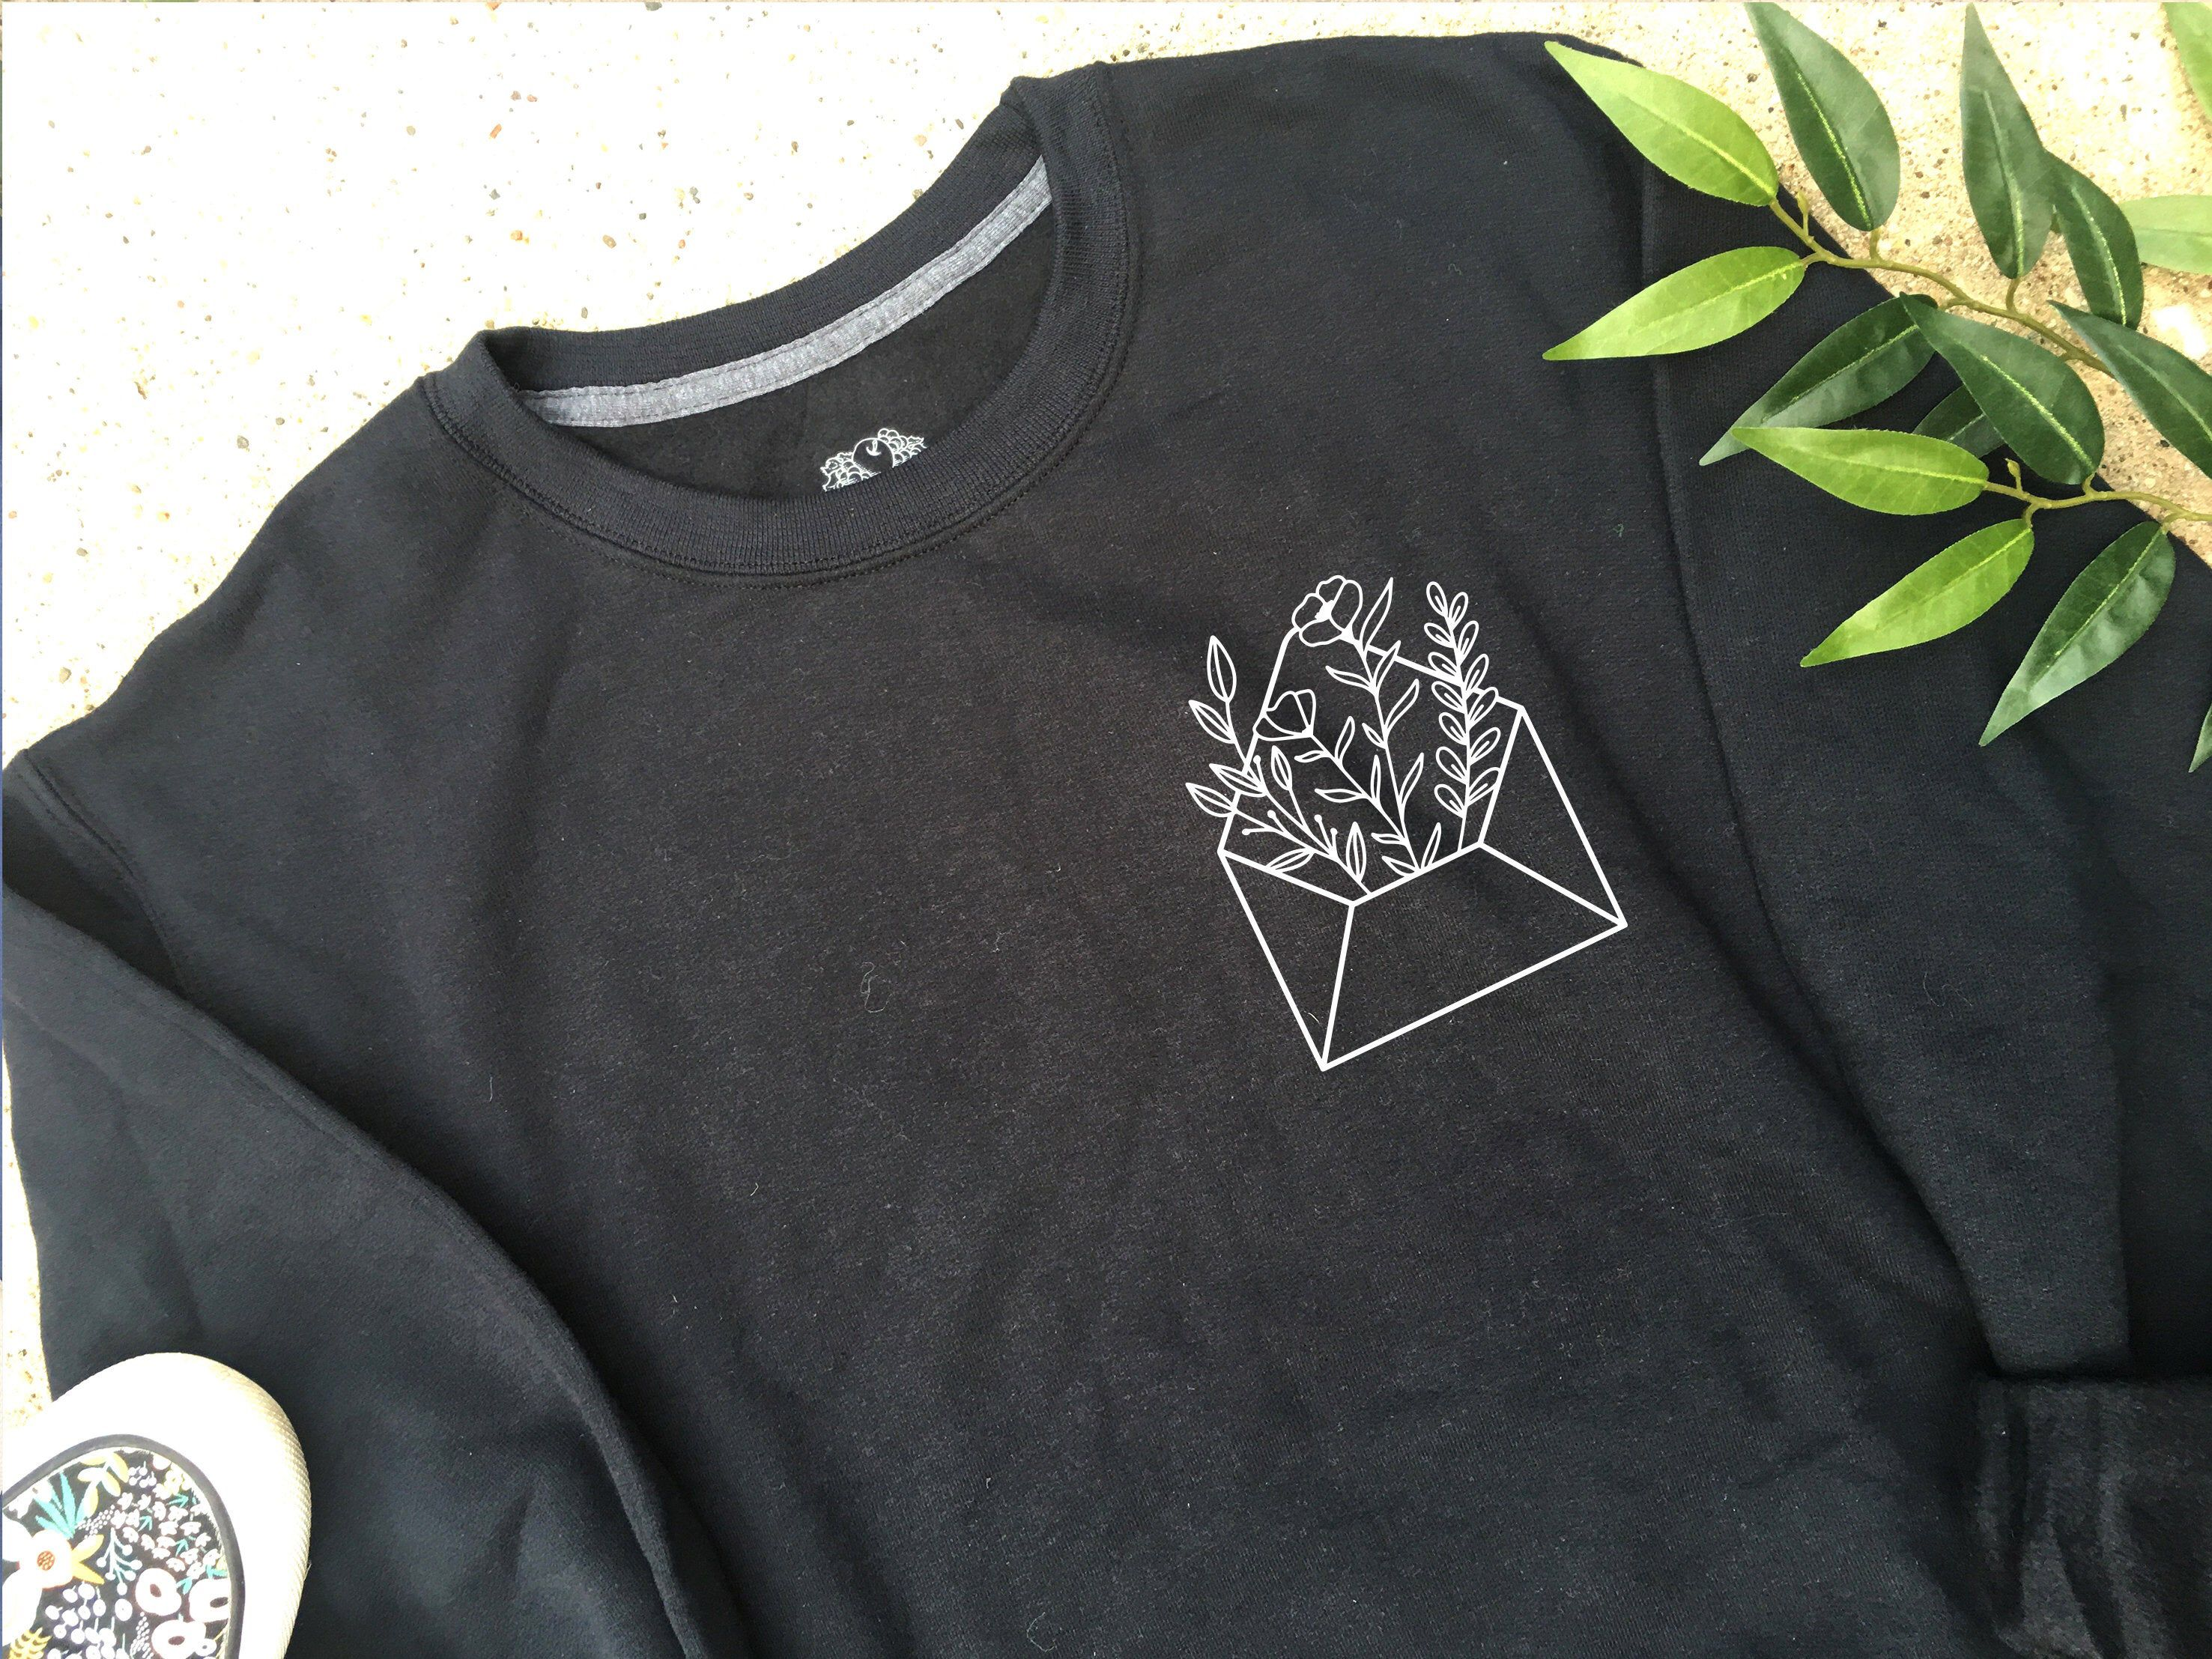 Floral Envelope Crewneck Graphic Tee Comfort Colors Etsy Comfort Colors Sweatshirt Shirt Designs Comfort Colors [ 2215 x 2953 Pixel ]